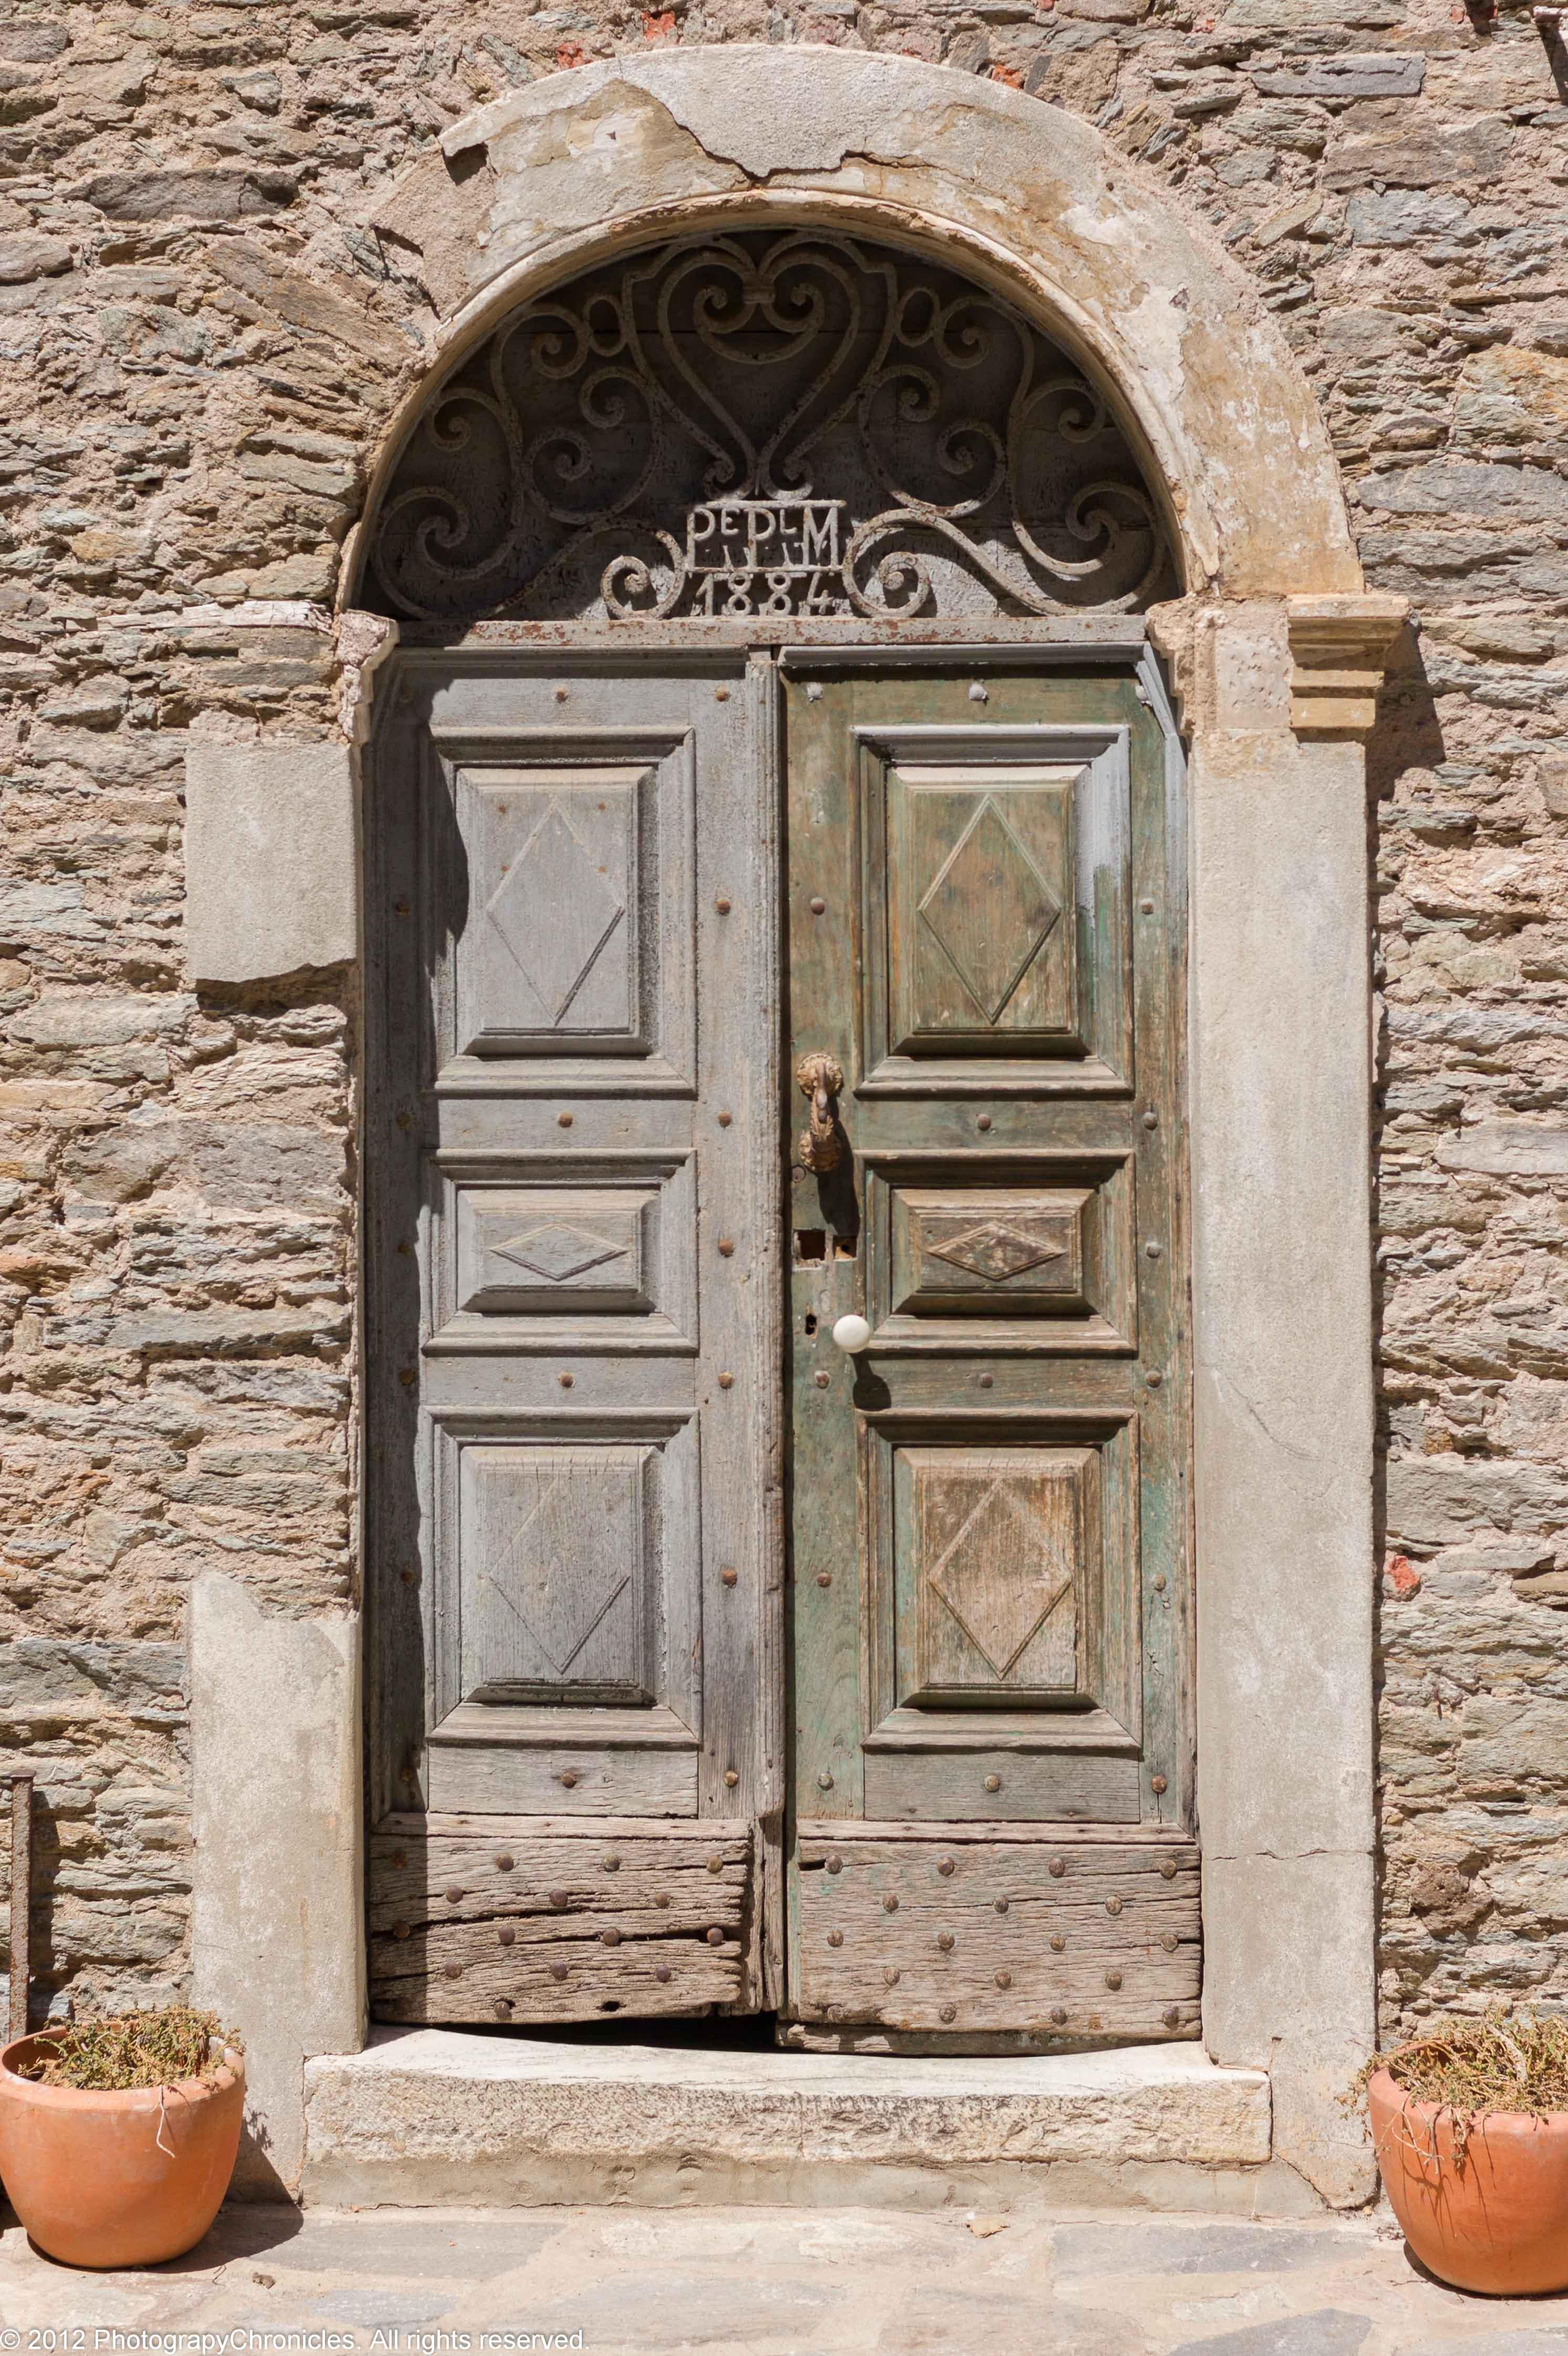 Rustic Doors Part Ii Filip Ghinea Photography Chronicles